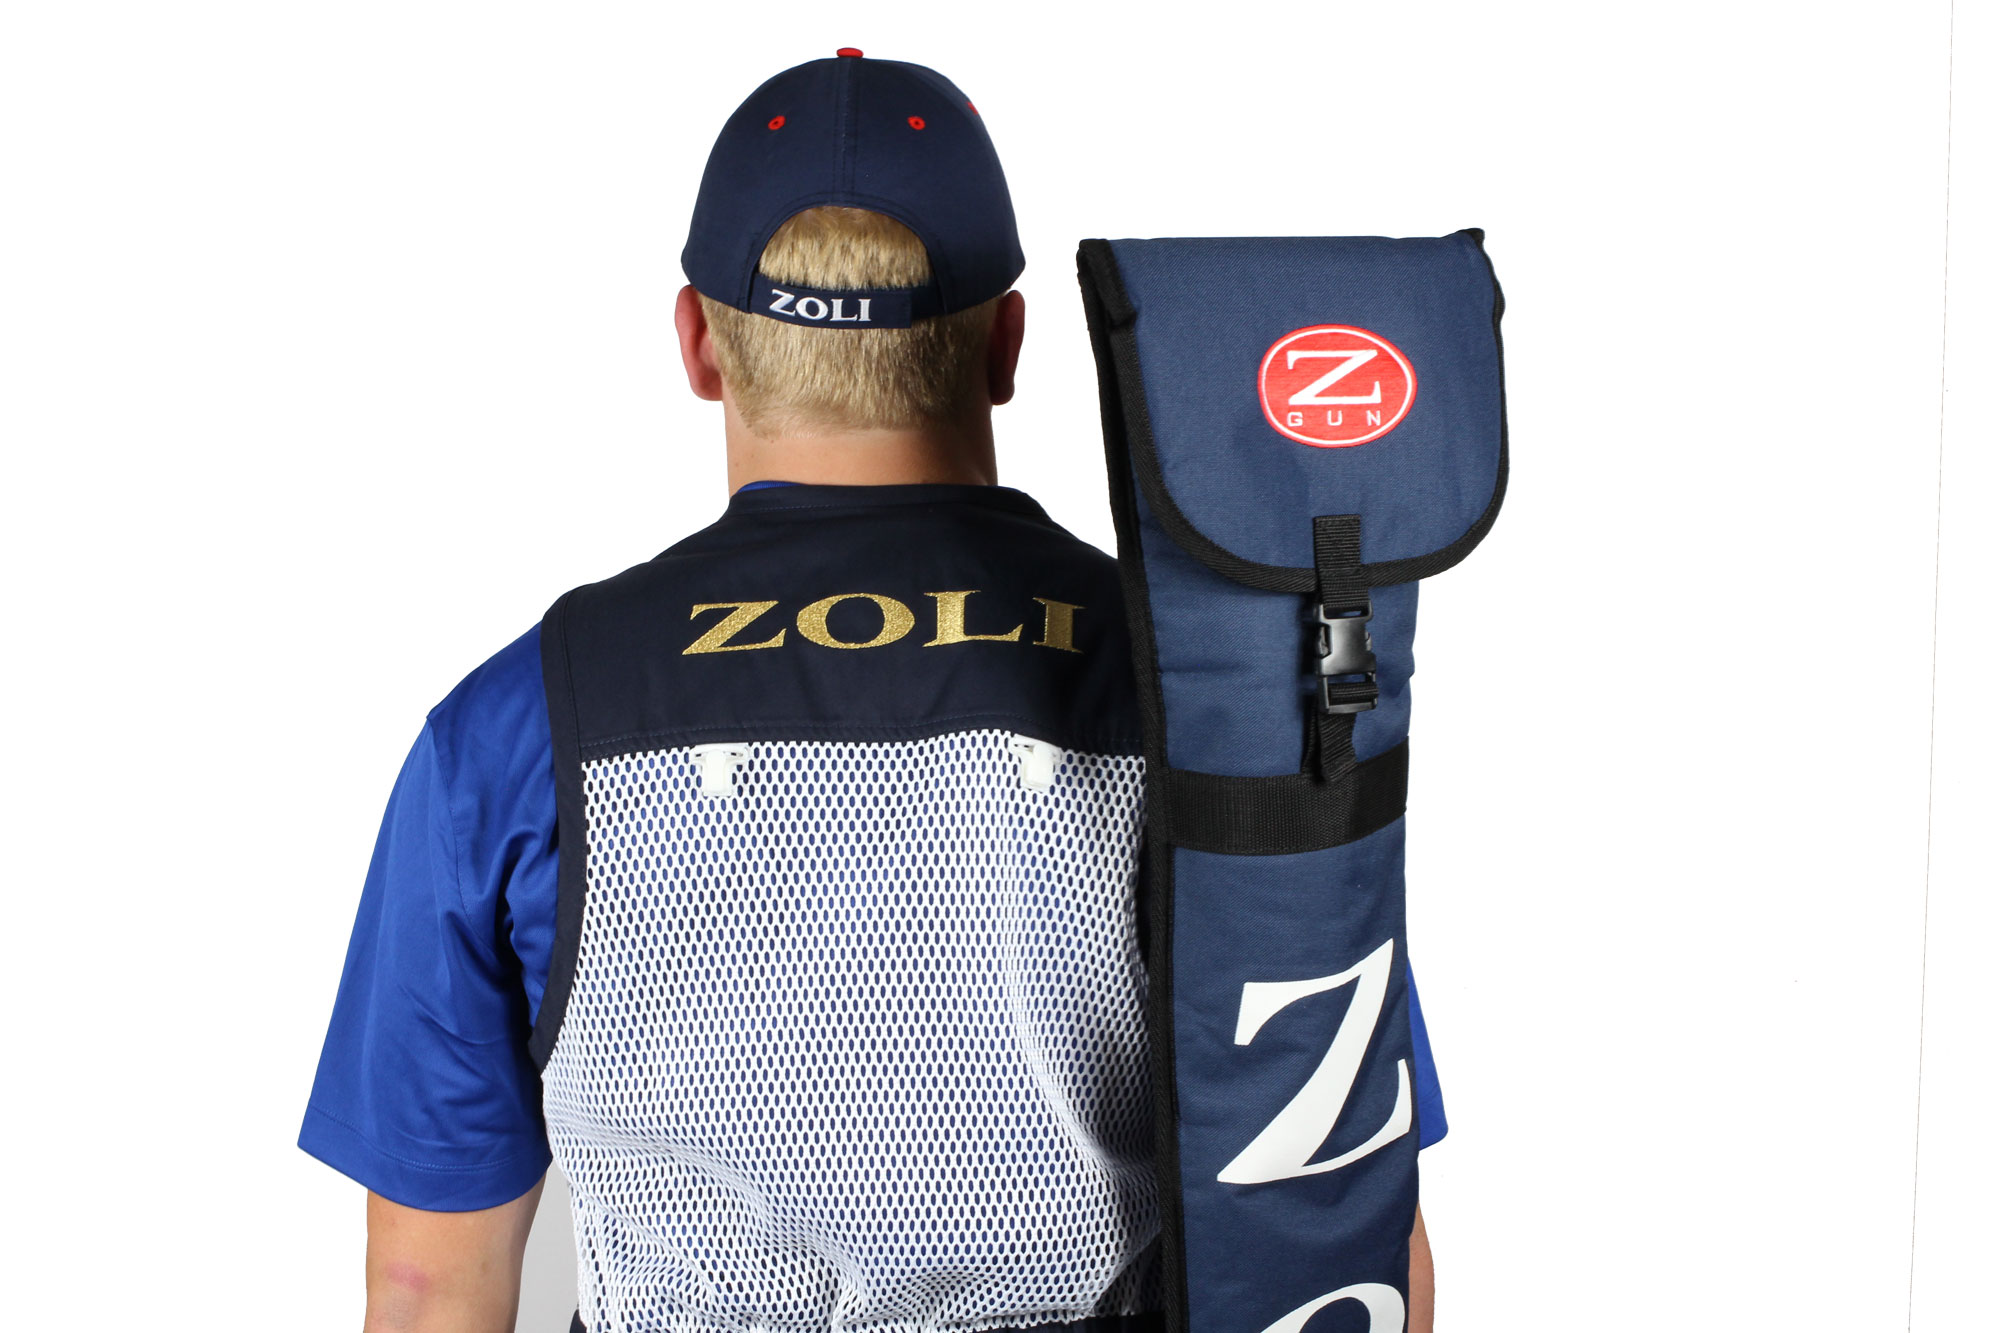 Zoli Shooting Gear